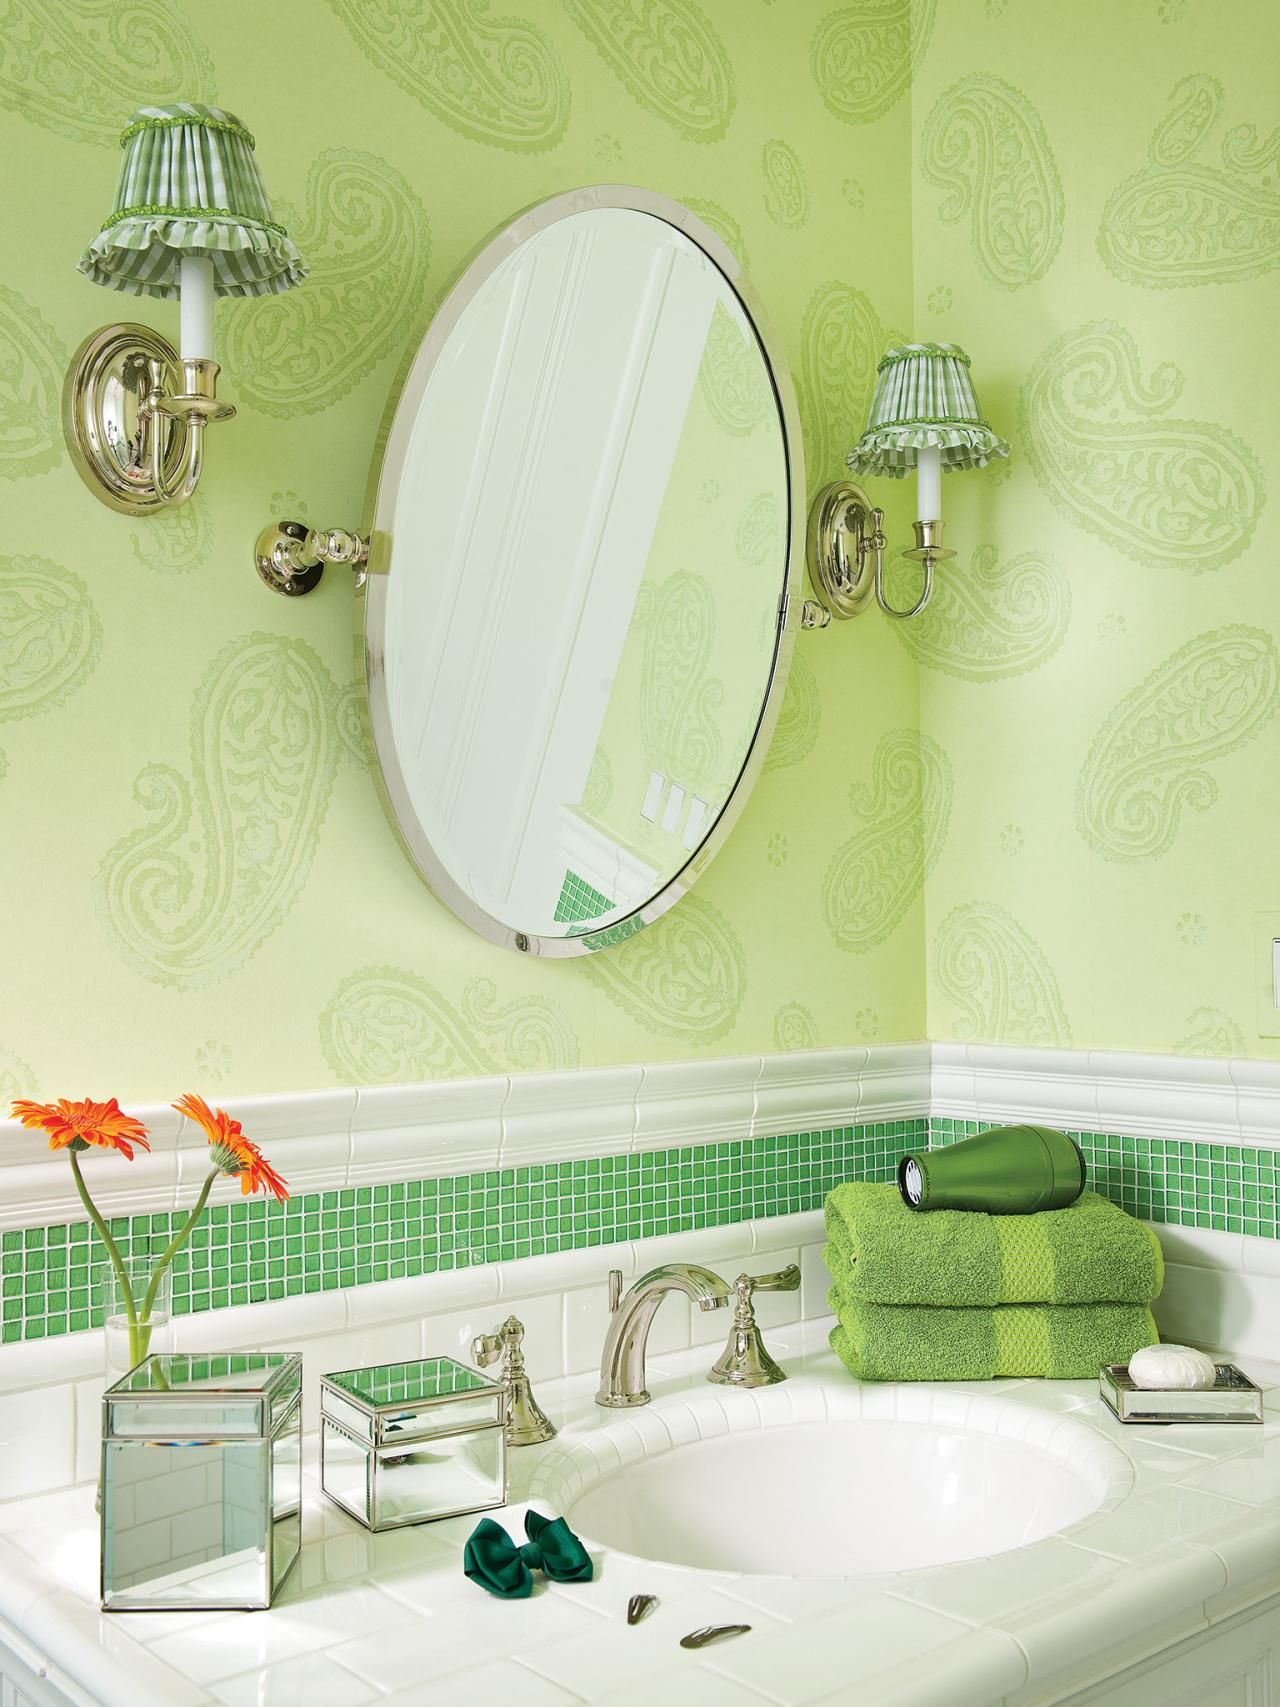 CI-Allure-of-French-and-Italian-Decor_Green-White-Bathroom-Pg79_3x4.jpg.rend_.hgtvcom.1280.1707